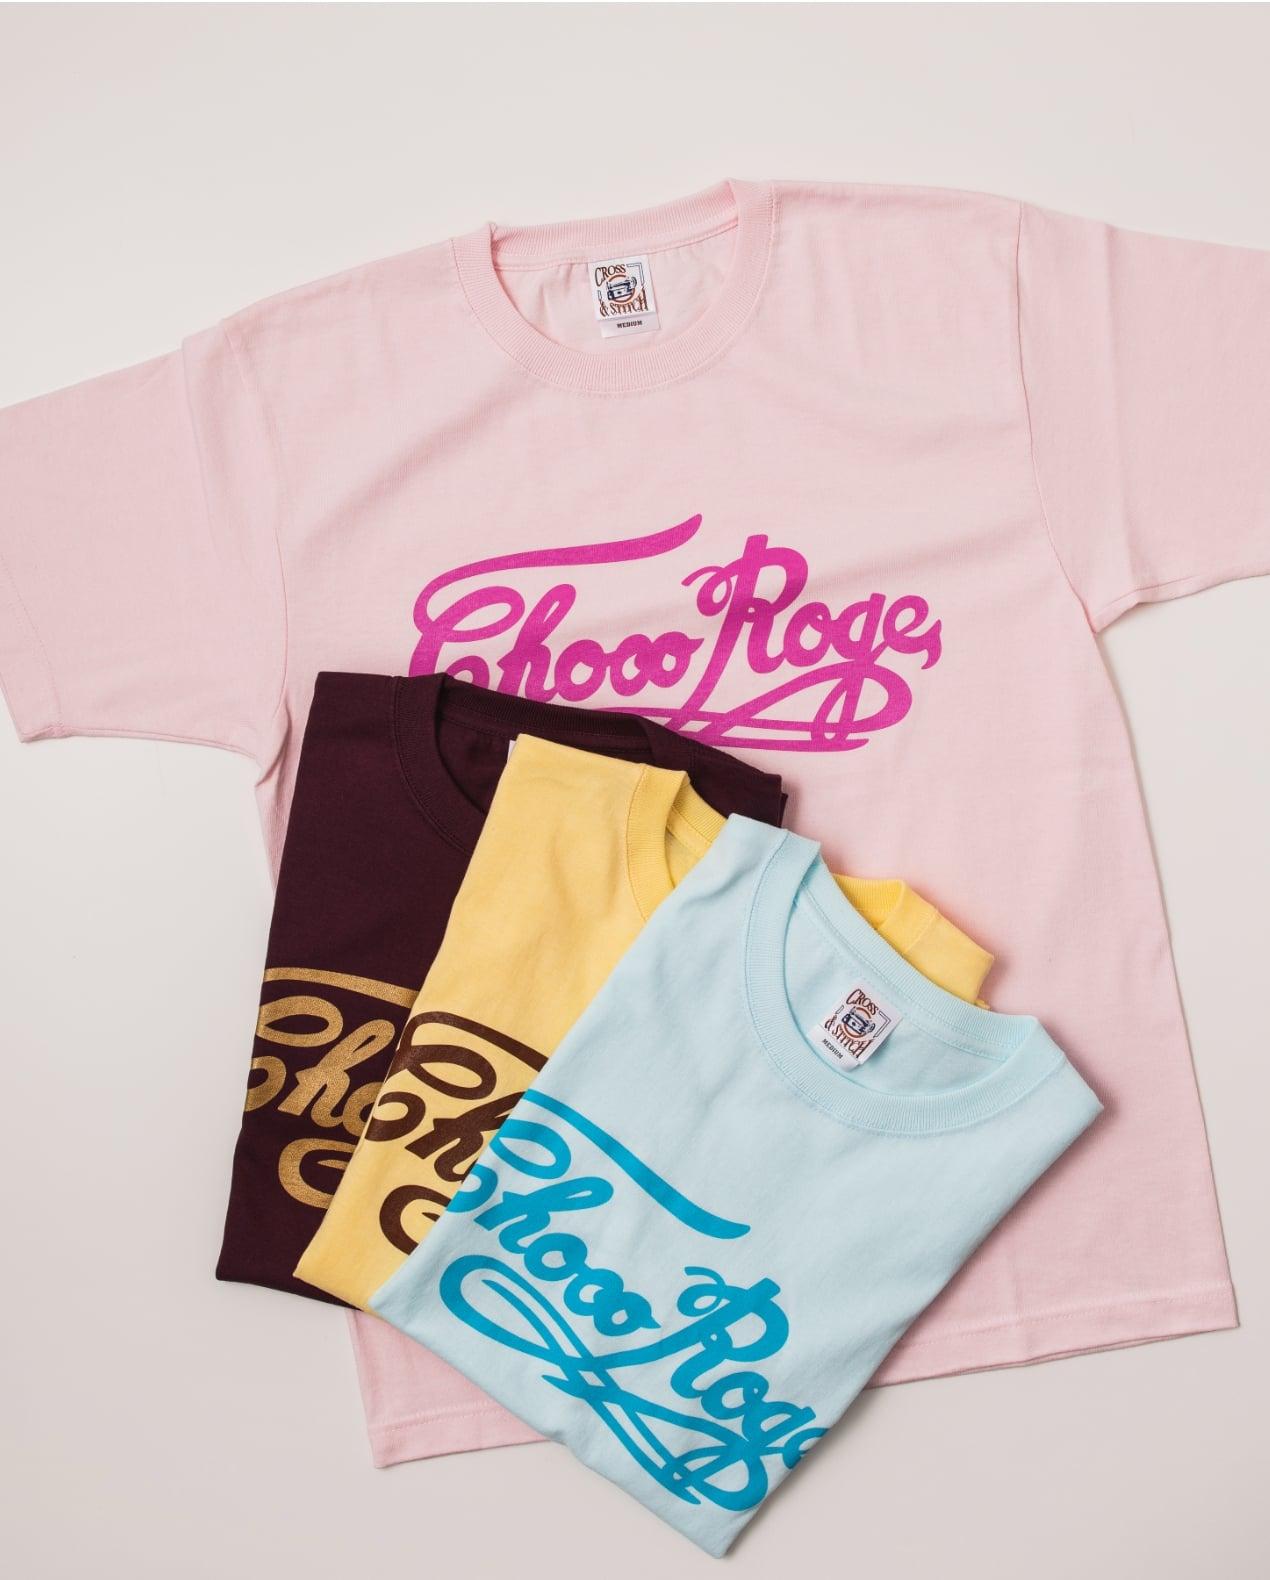 Tシャツ 子供用 ピンク サイズ120